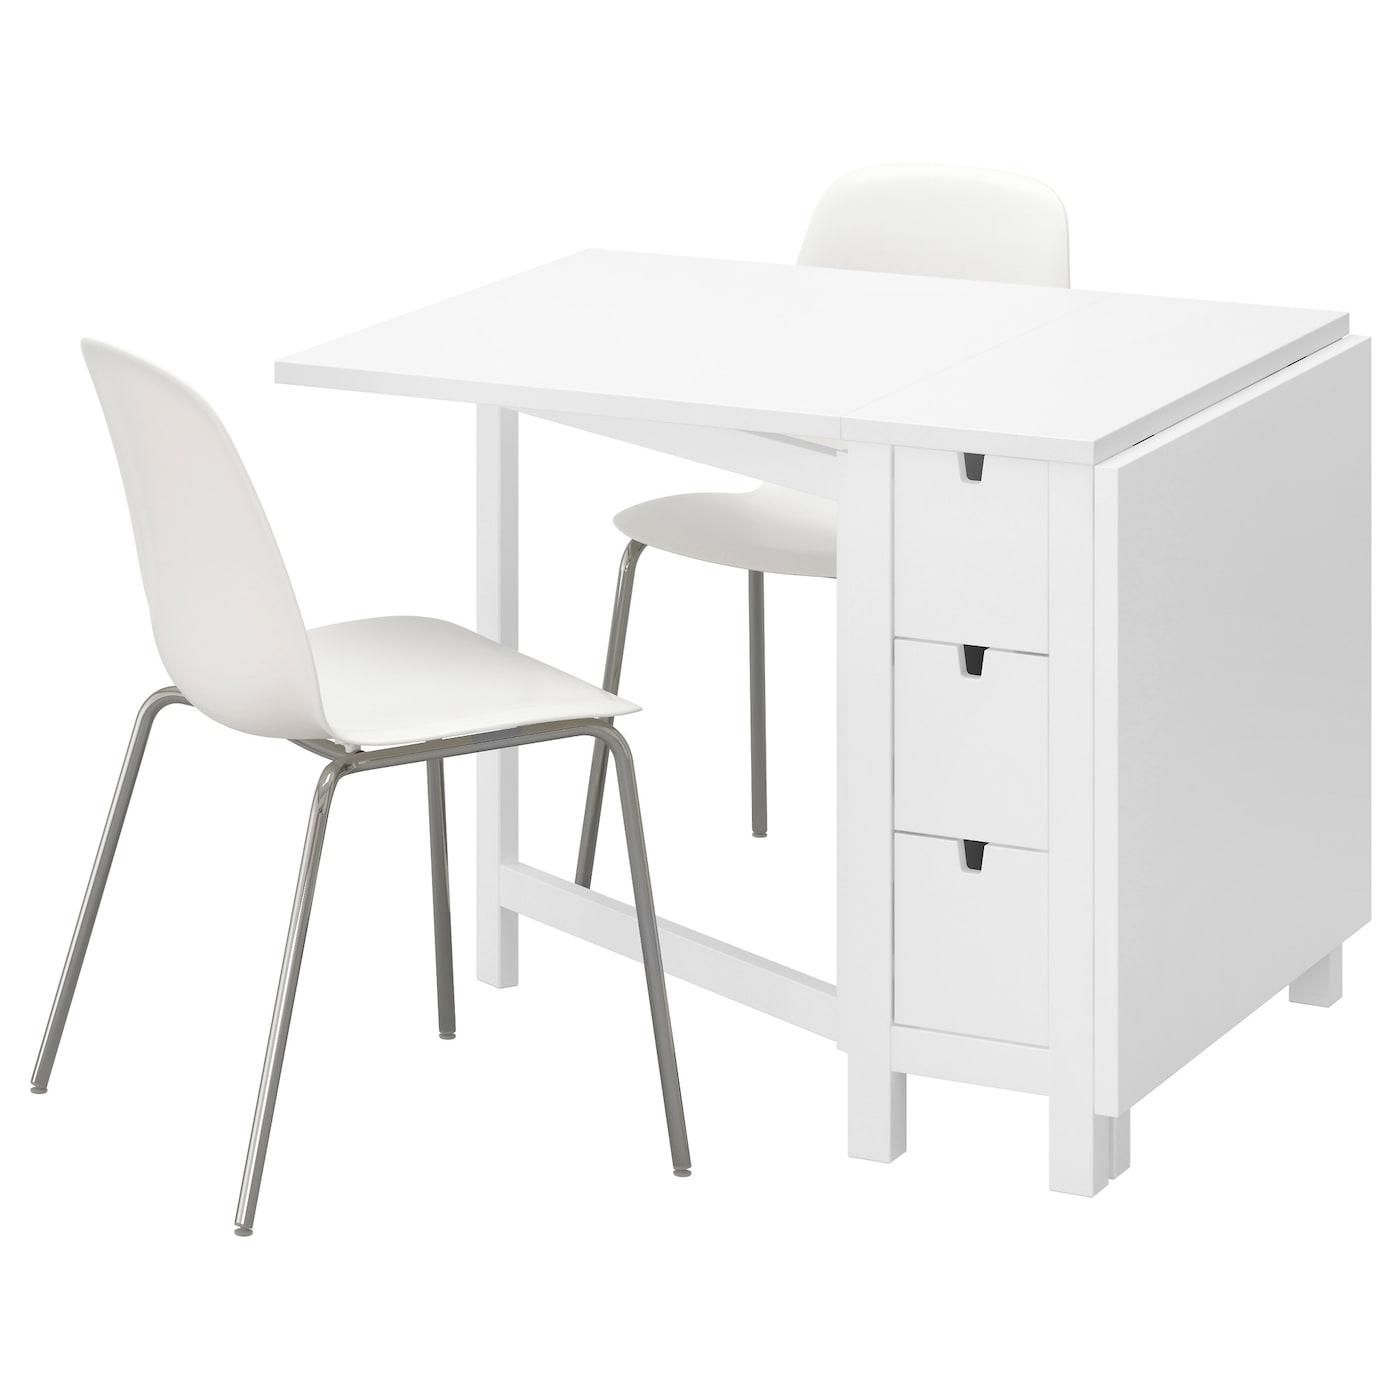 norden leifarne table et 2 chaises blanc blanc chrom 89 cm ikea. Black Bedroom Furniture Sets. Home Design Ideas